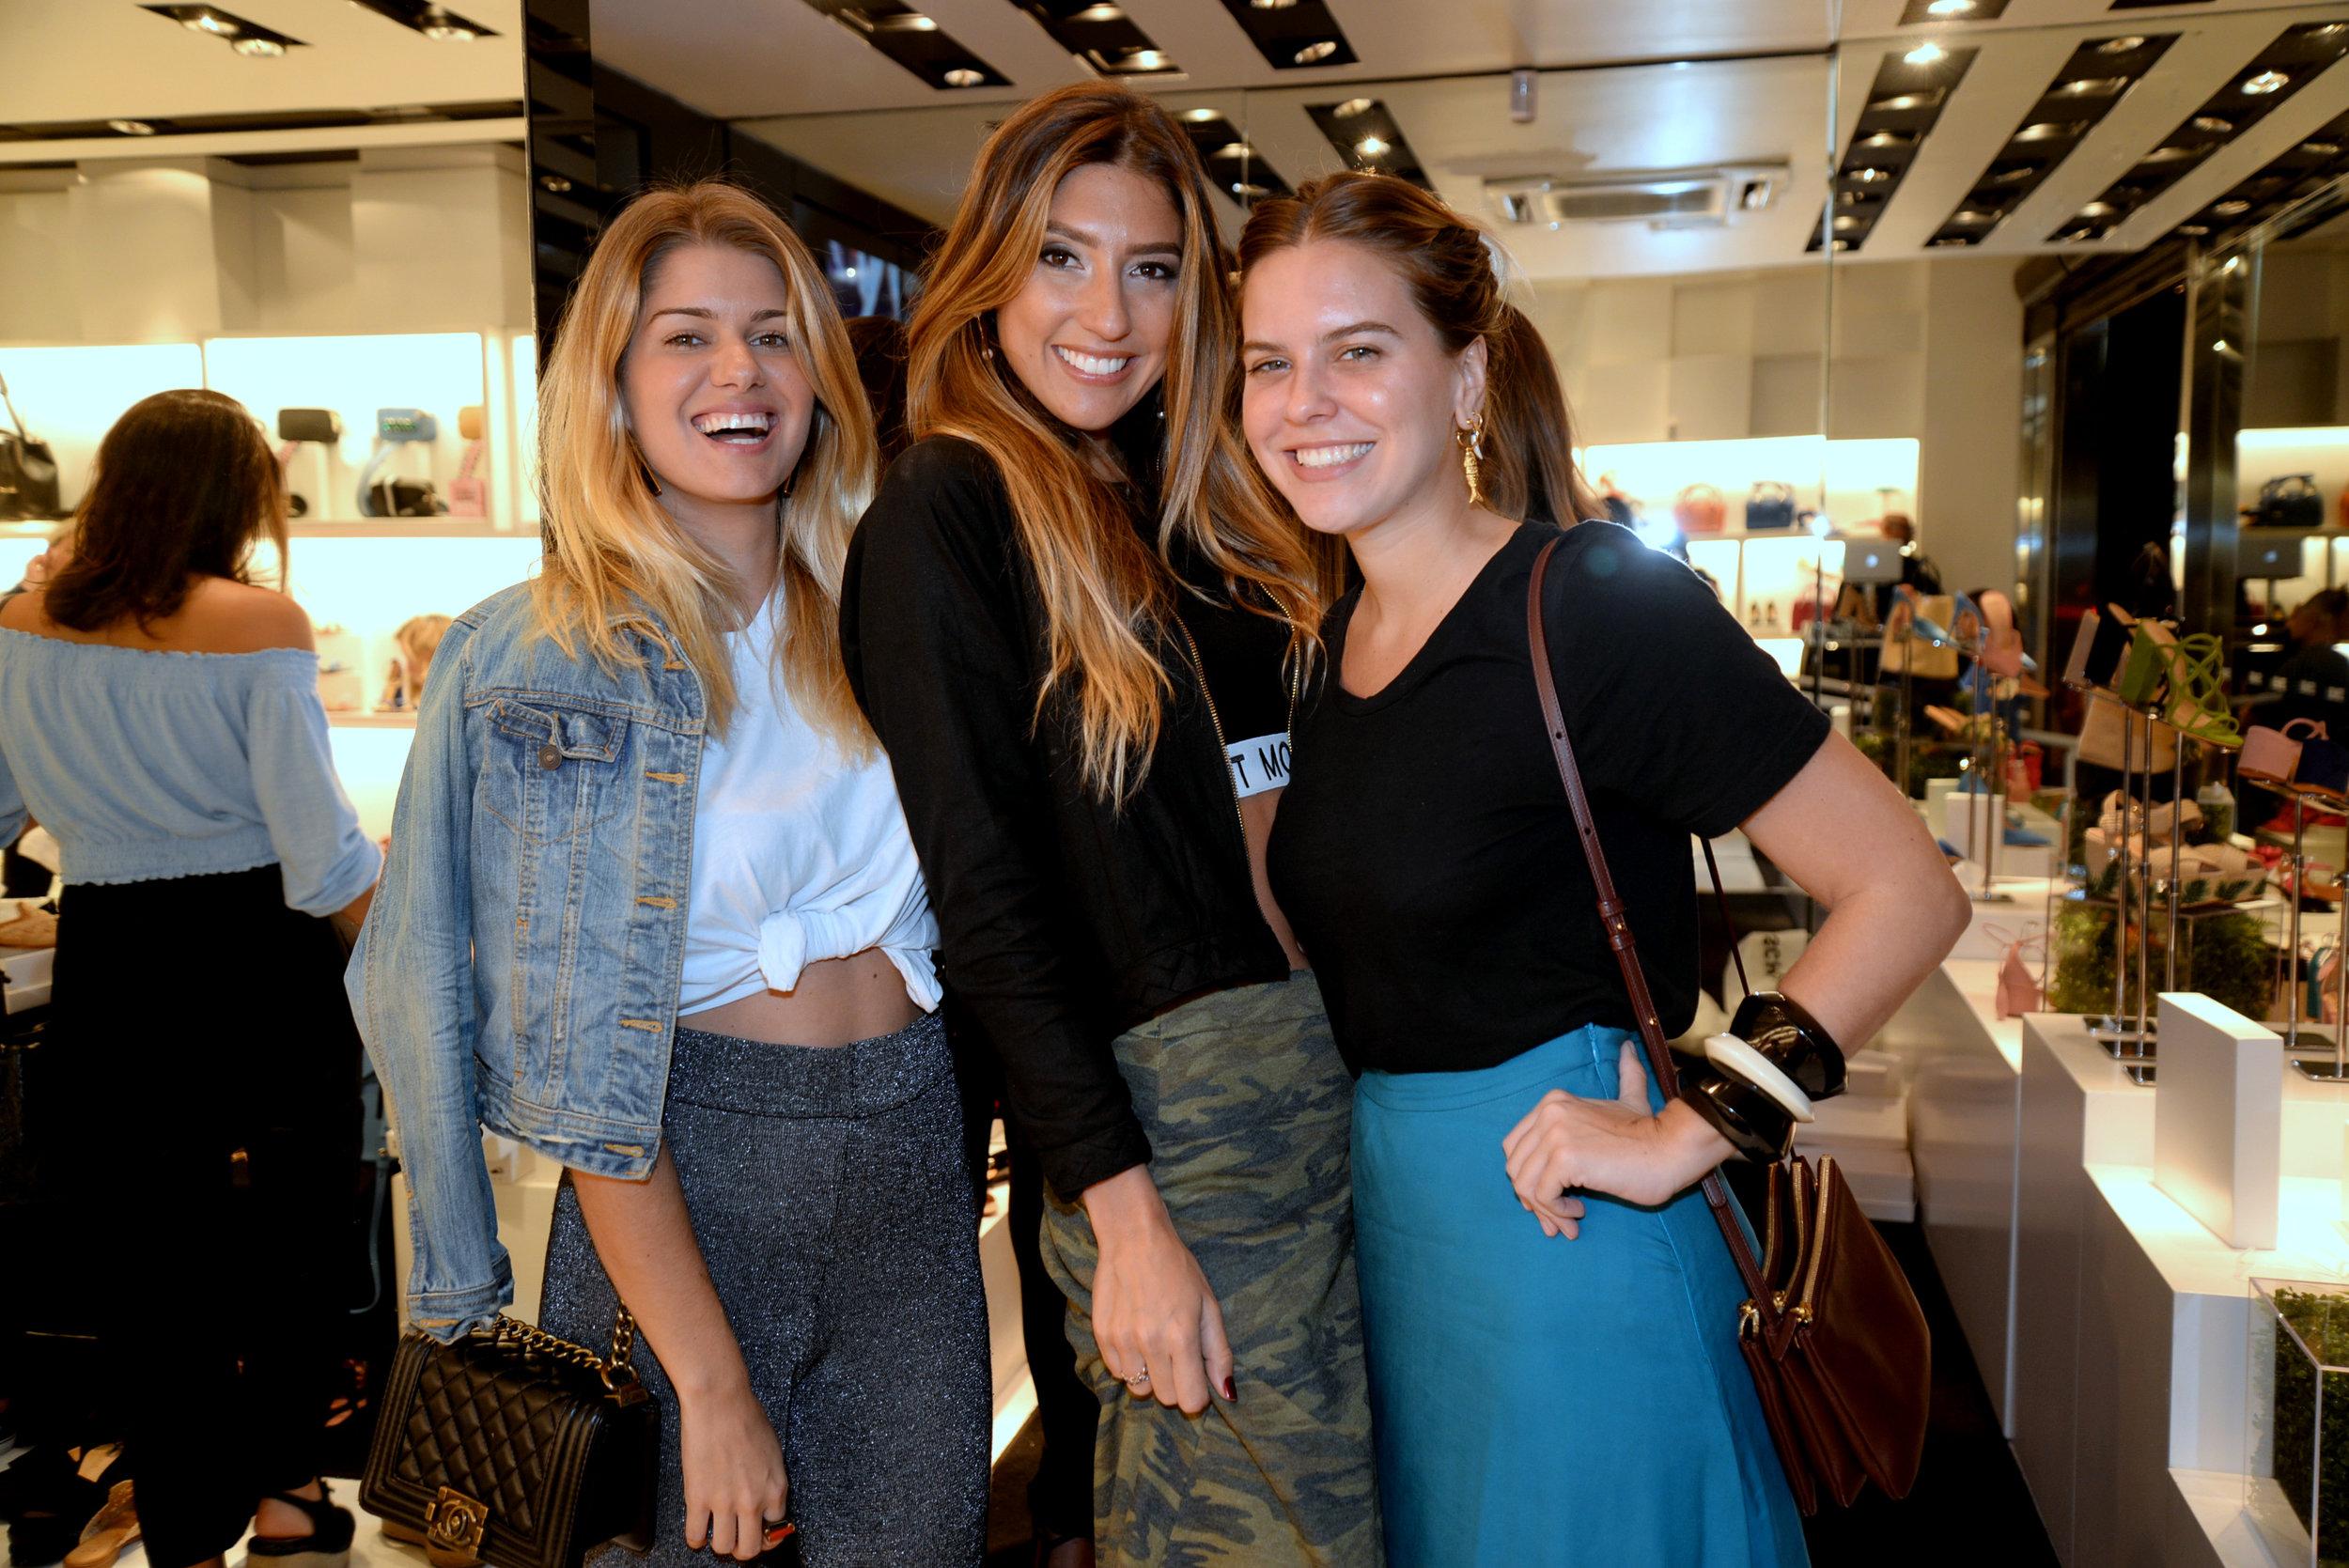 Aninha Bonilha, Luiza DAngelo e Nathalia Medeiros_DSC_5638.JPG